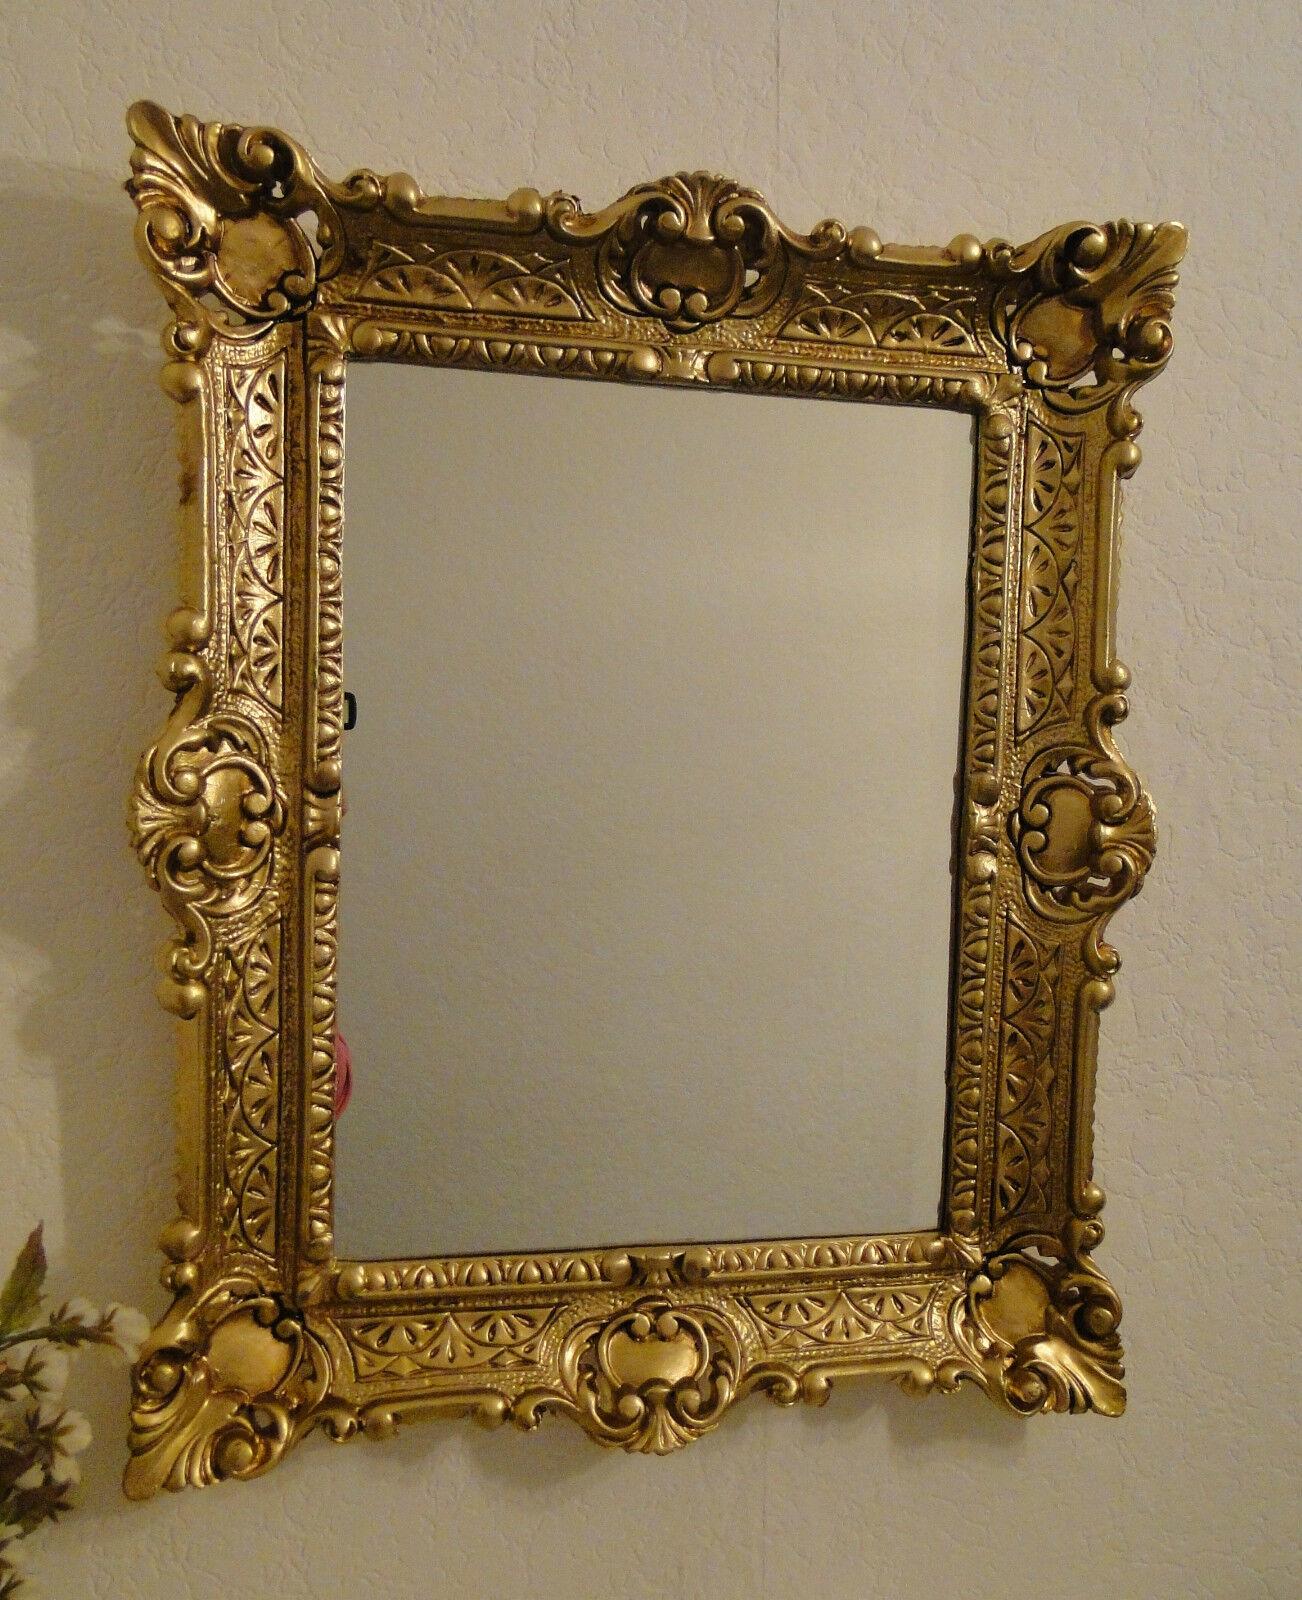 bilderrahmen jugendstil gold antik rechteckig 56x46 barock 30x40 mit r ckwand kaufen bei. Black Bedroom Furniture Sets. Home Design Ideas